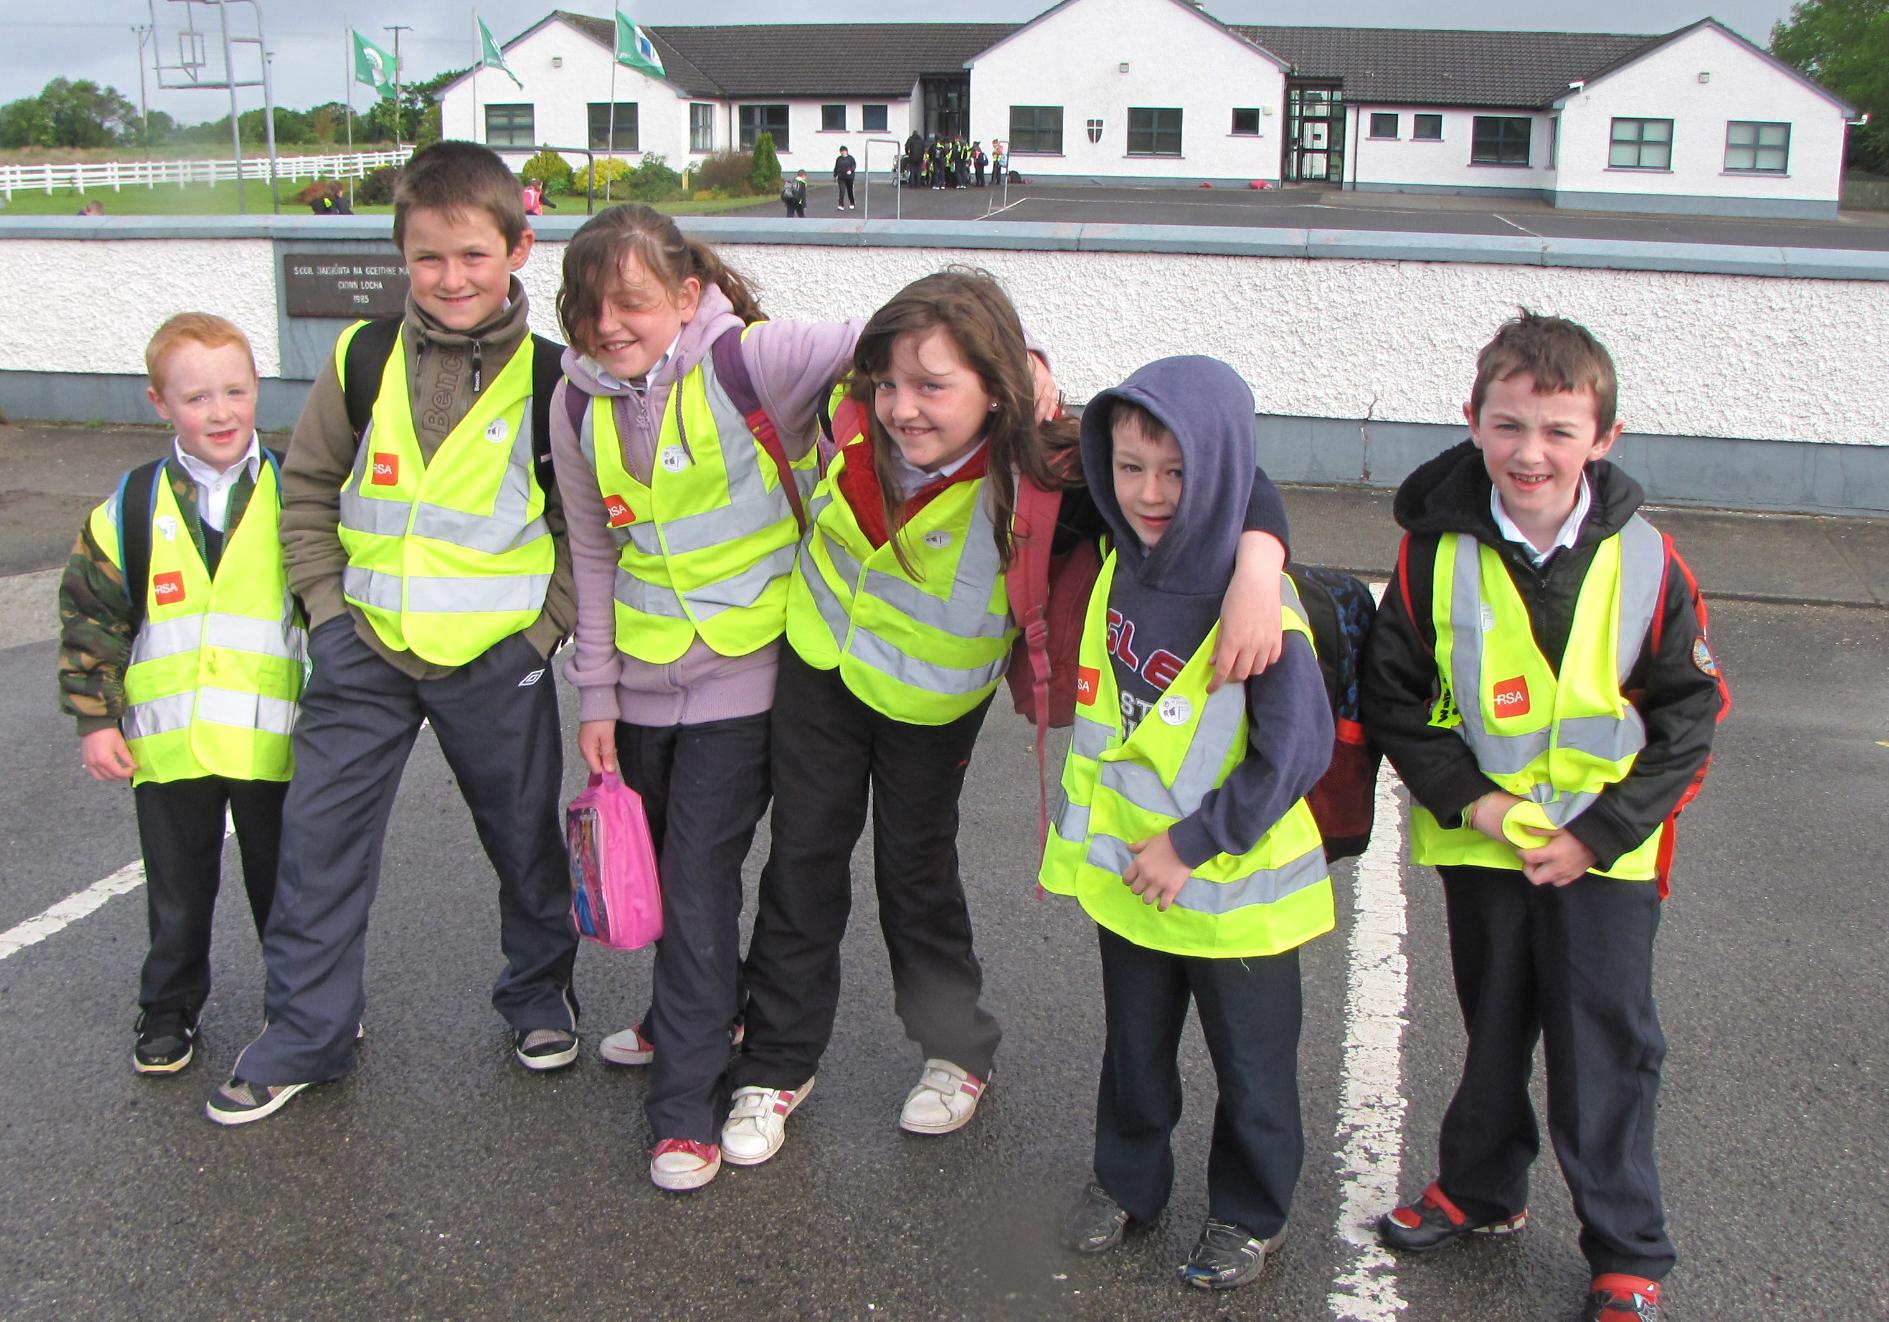 Walk to School Week 2012